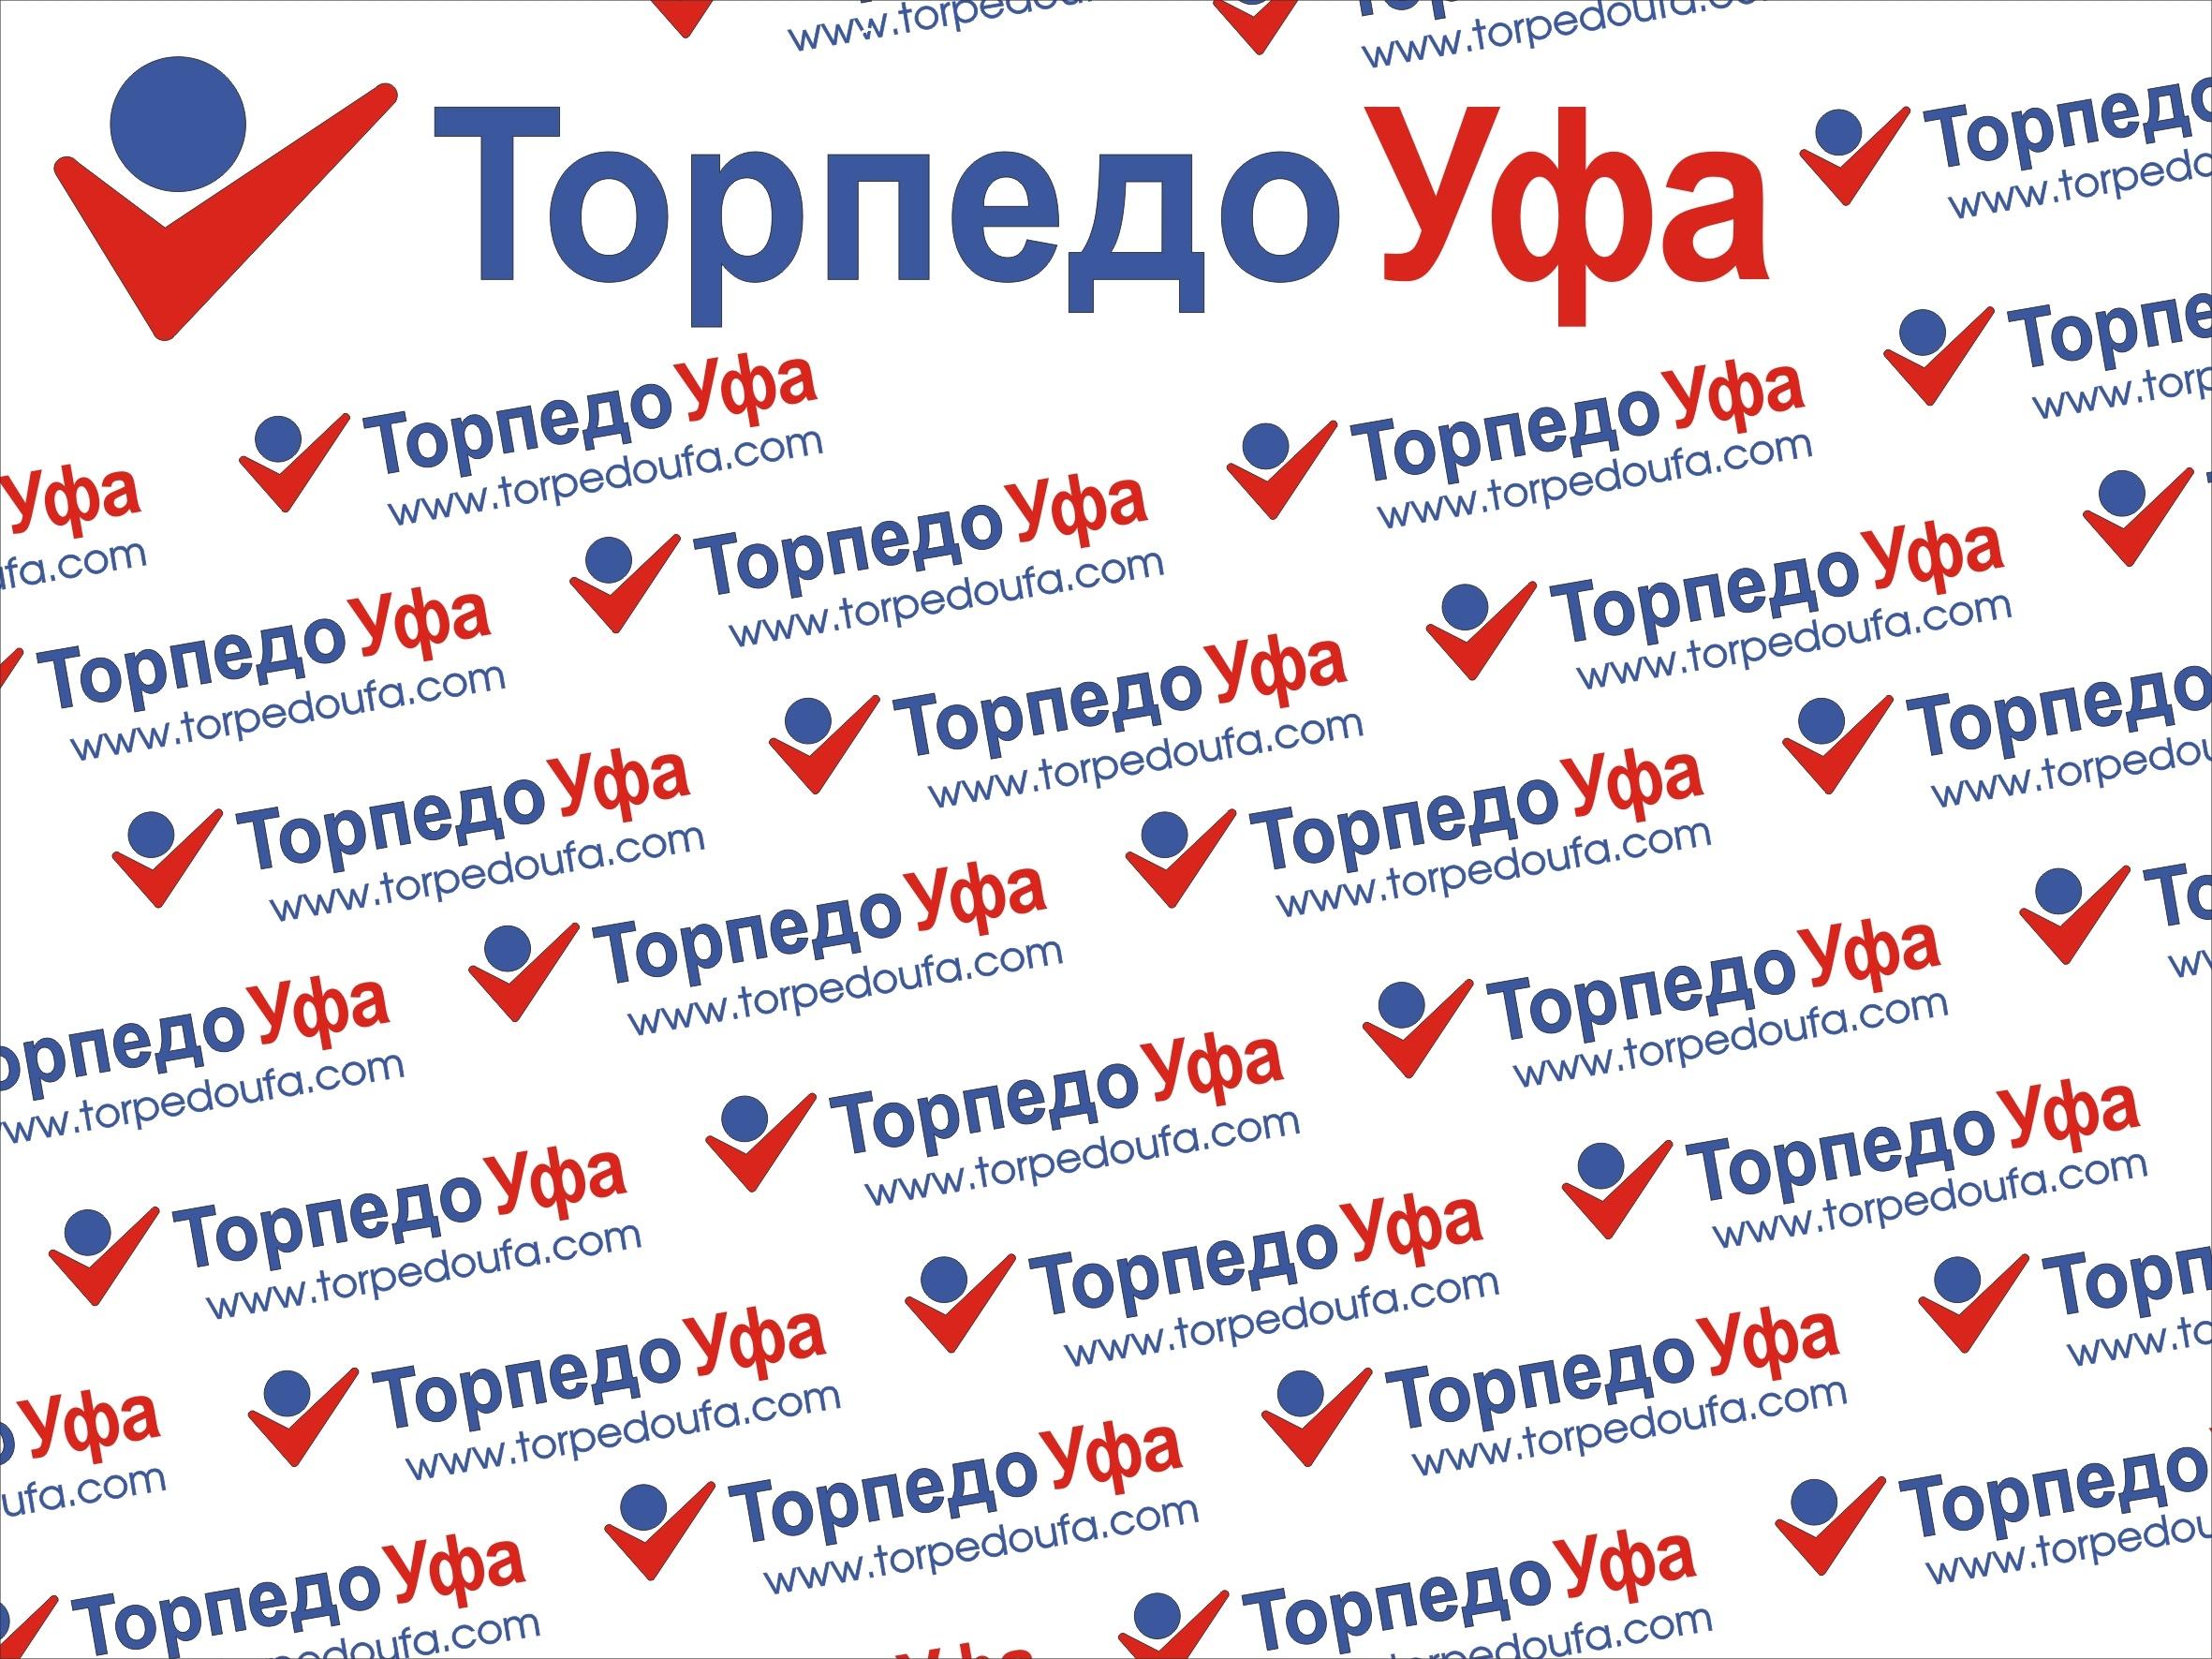 Резервная_копия_торпедо банер.jpg